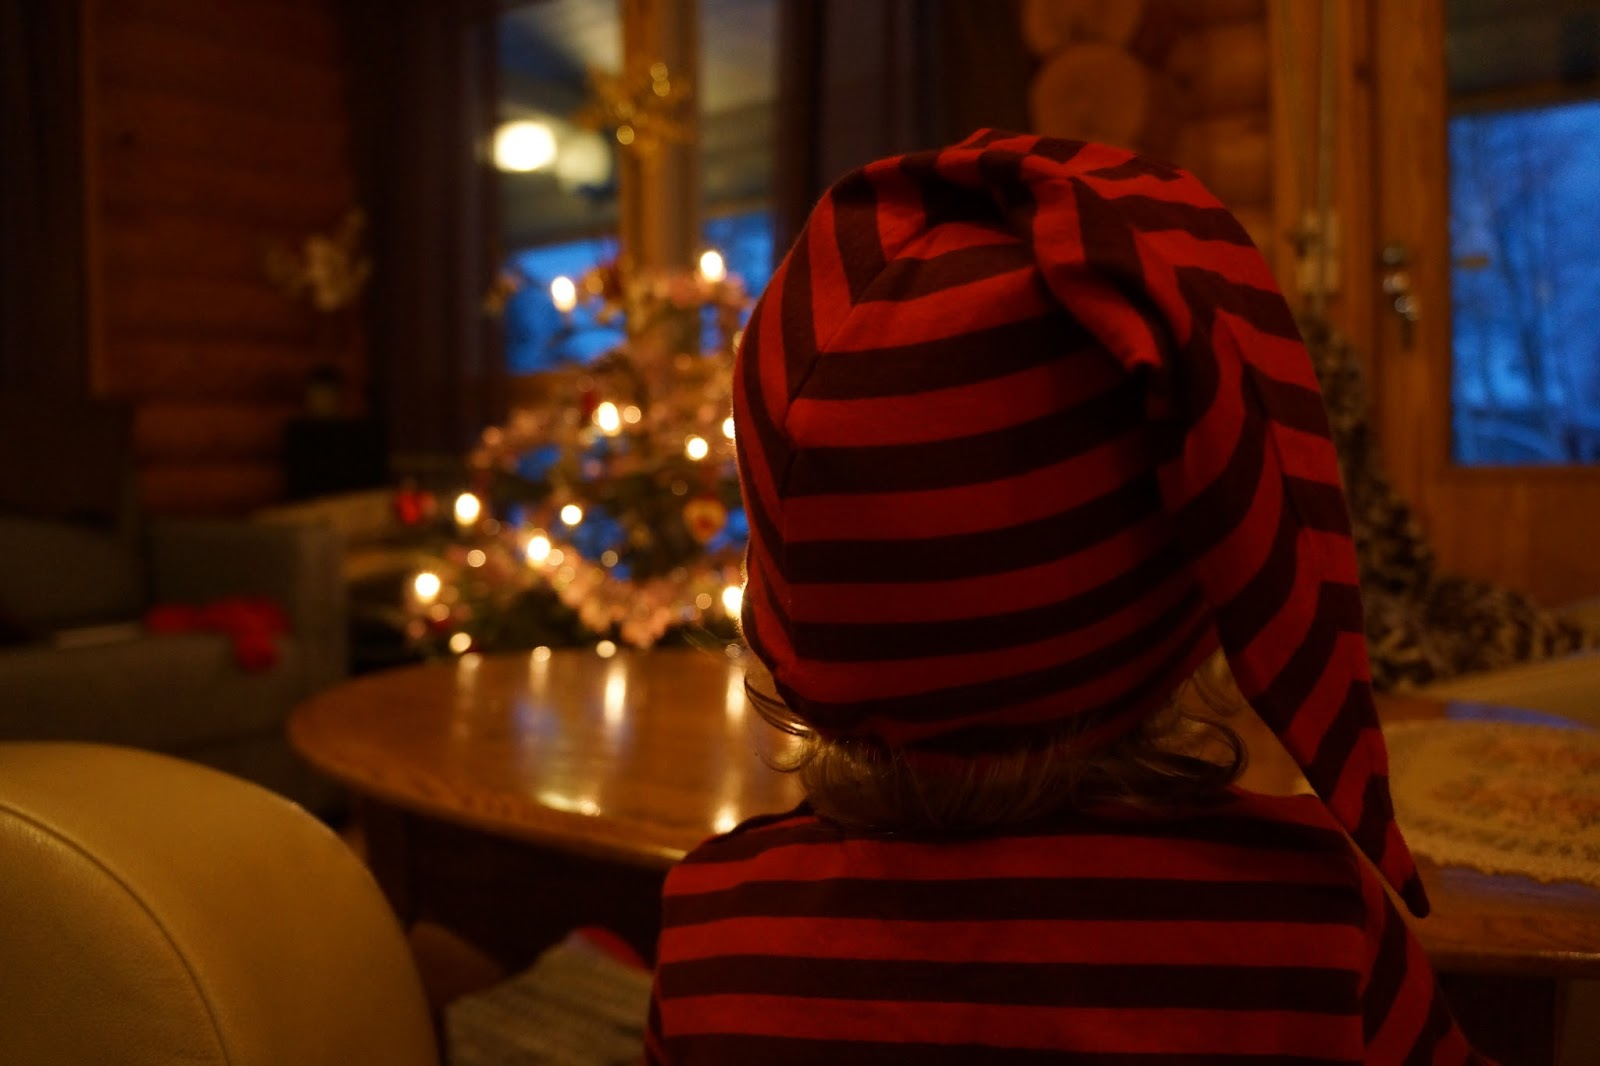 toddler wearing finnish marimekko elf hat in front of a christmas tree